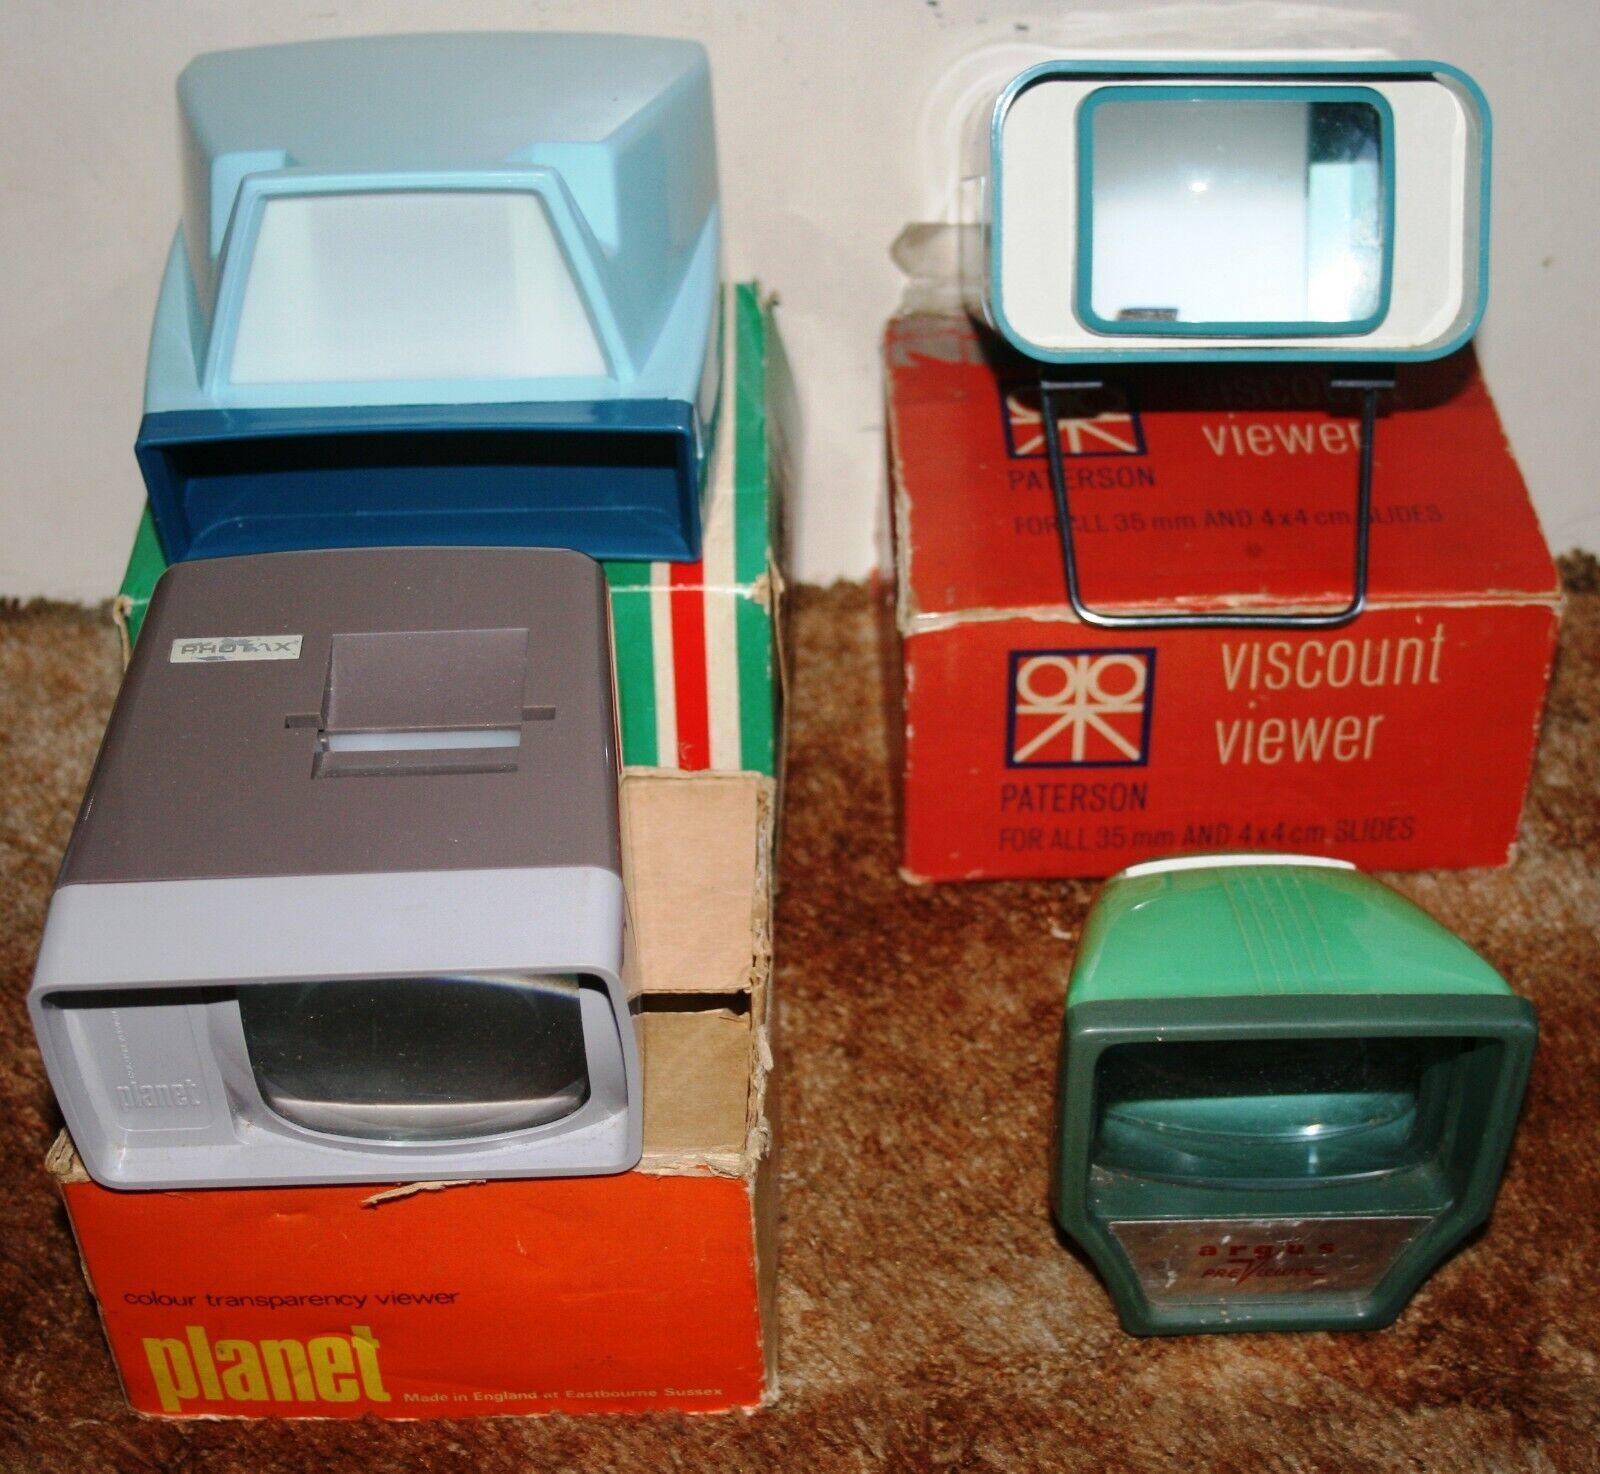 Viscount / Hanimex / Photax / Argus - 35mm Slide / Transparency Viewer - Job Lot